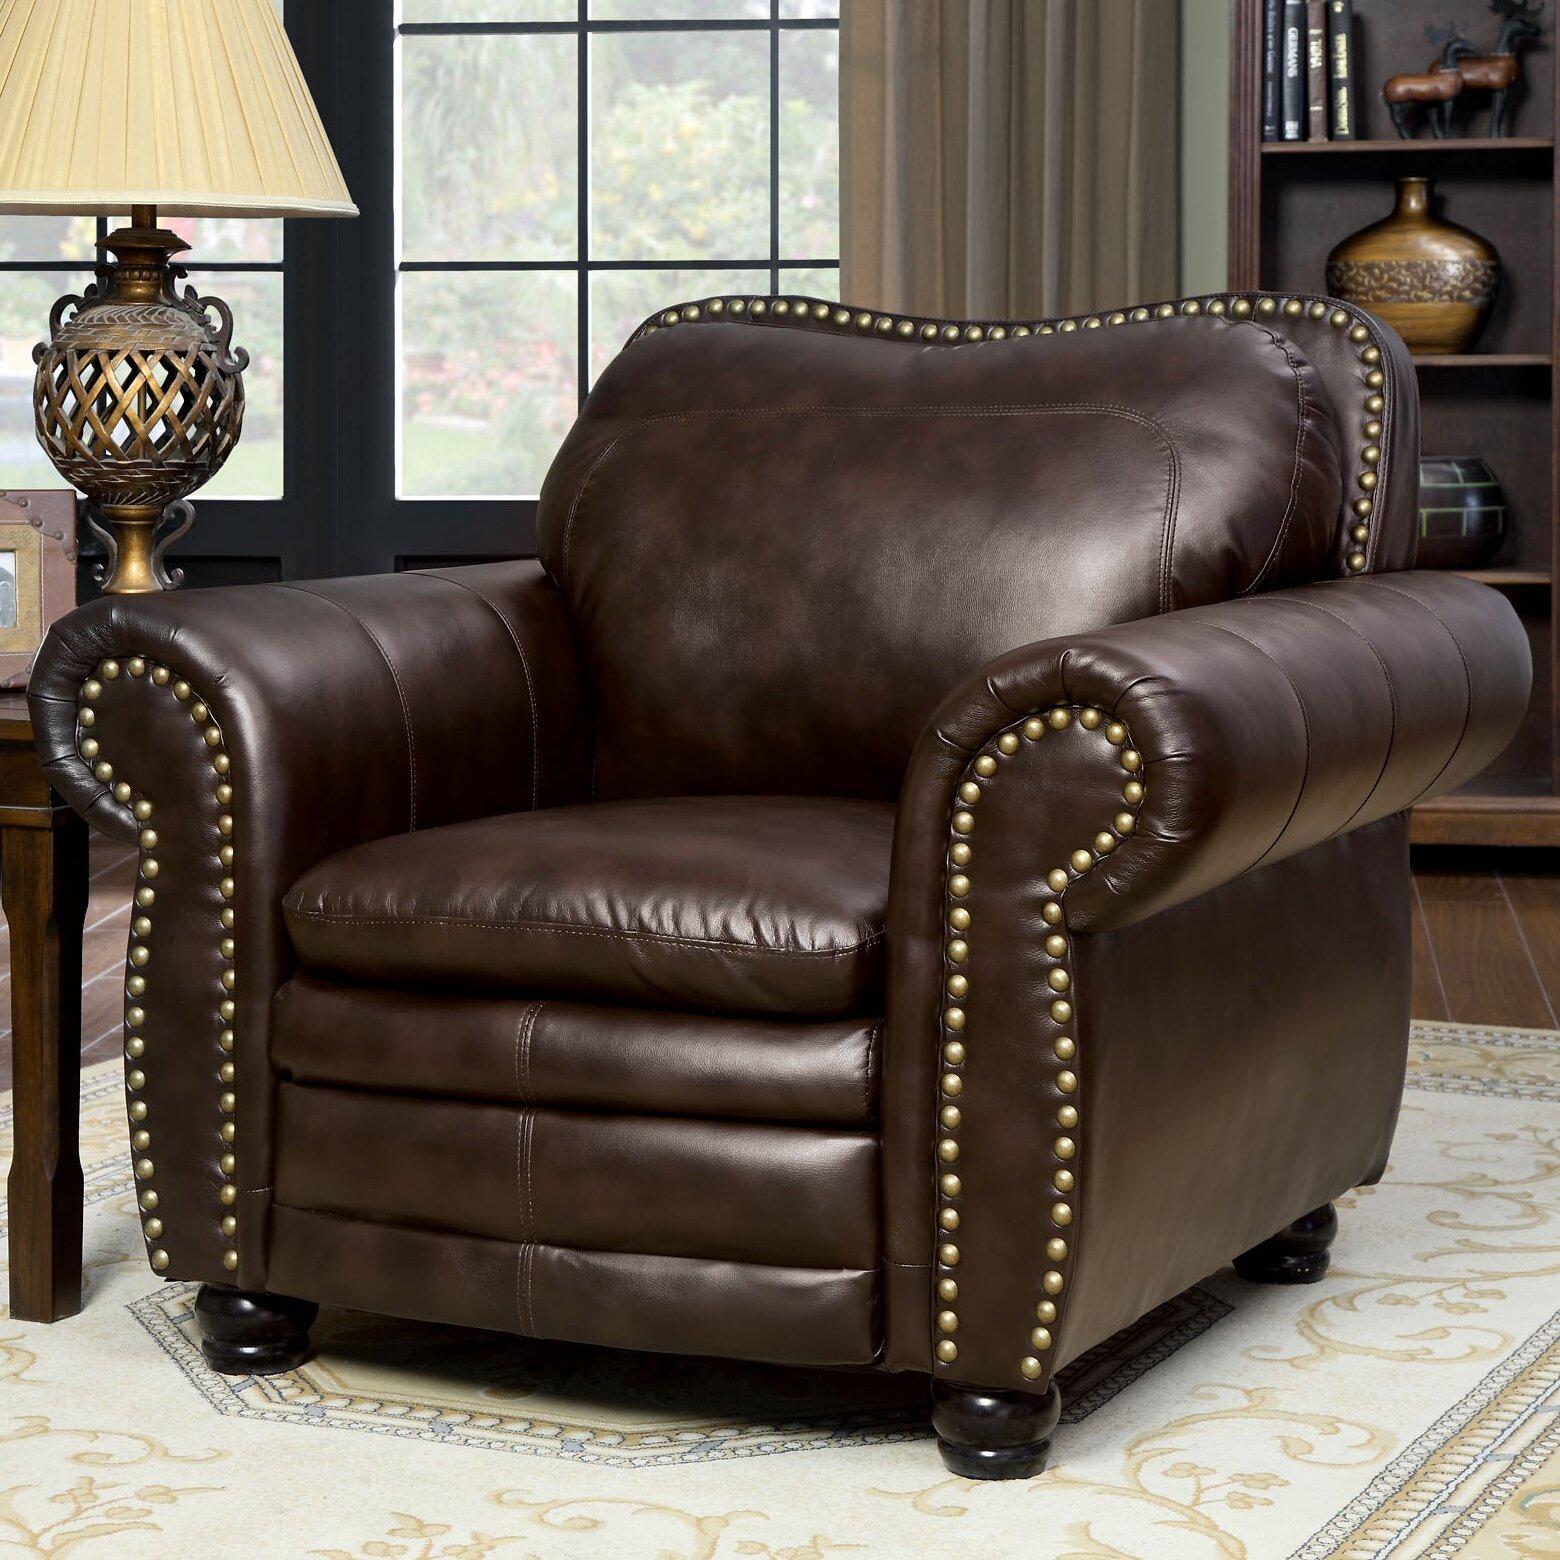 Hokku designs hearthe living room collection reviews for Hokku designs living room furniture